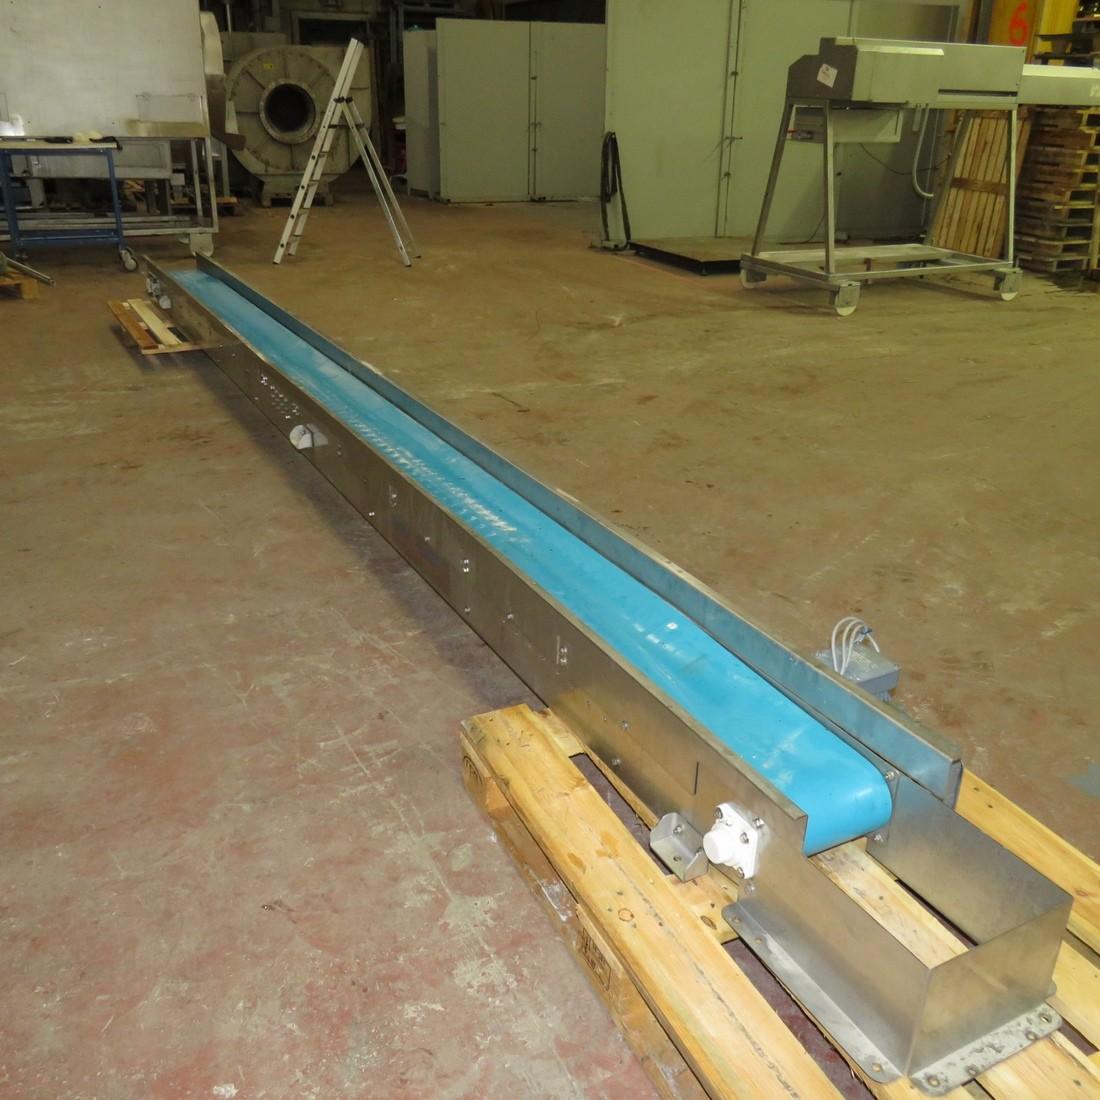 R4FB1190 Stainless stell frame belt conveyor - Lenght 5330 mm - width 250 mm